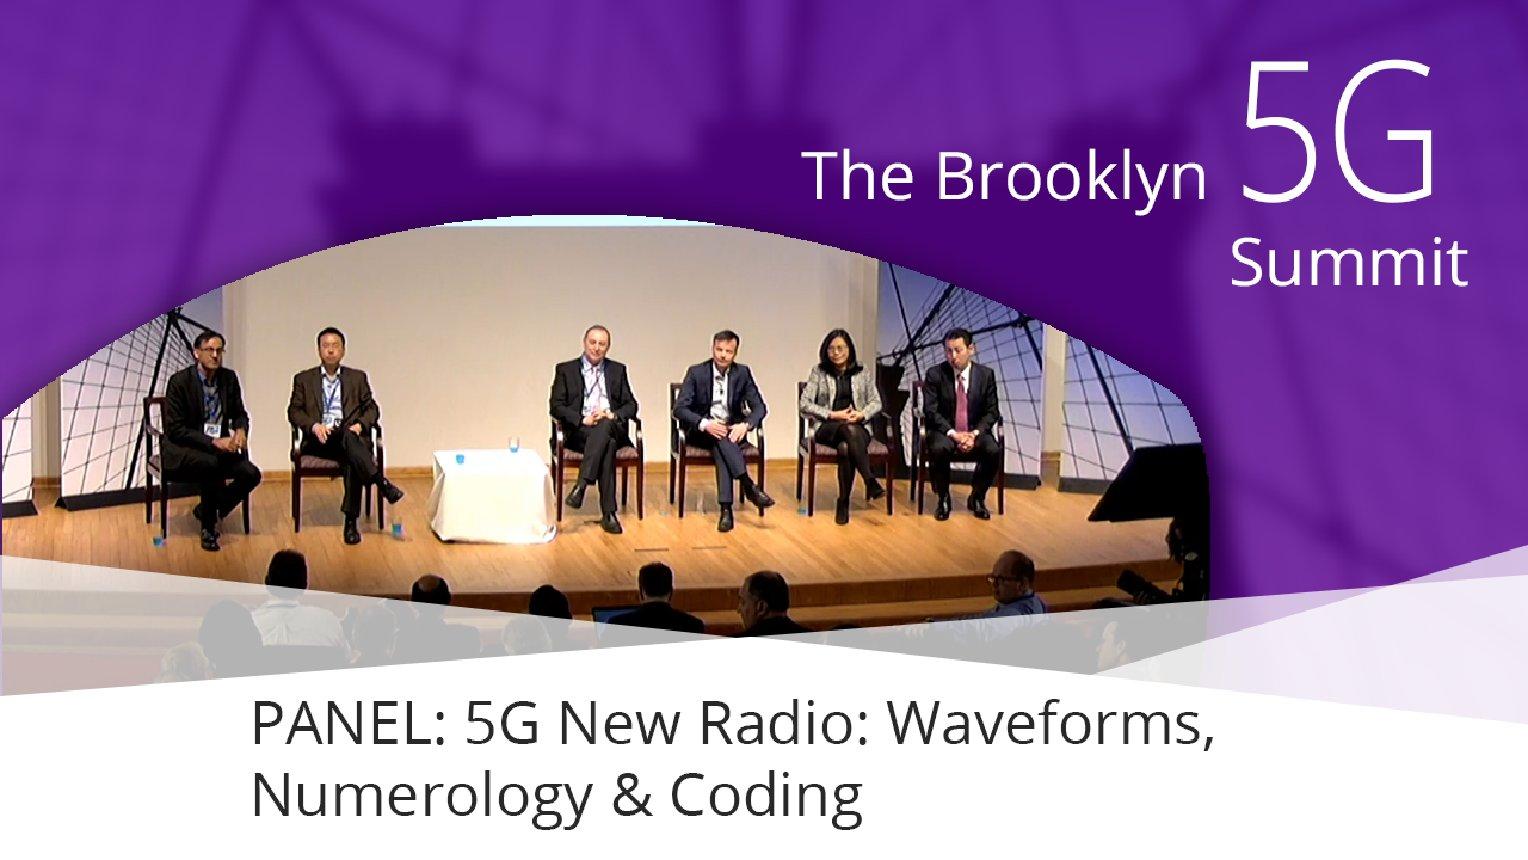 PANEL - 5G New Radio: Waveforms, Numerology, Coding: Brooklyn 5G Summit 2017